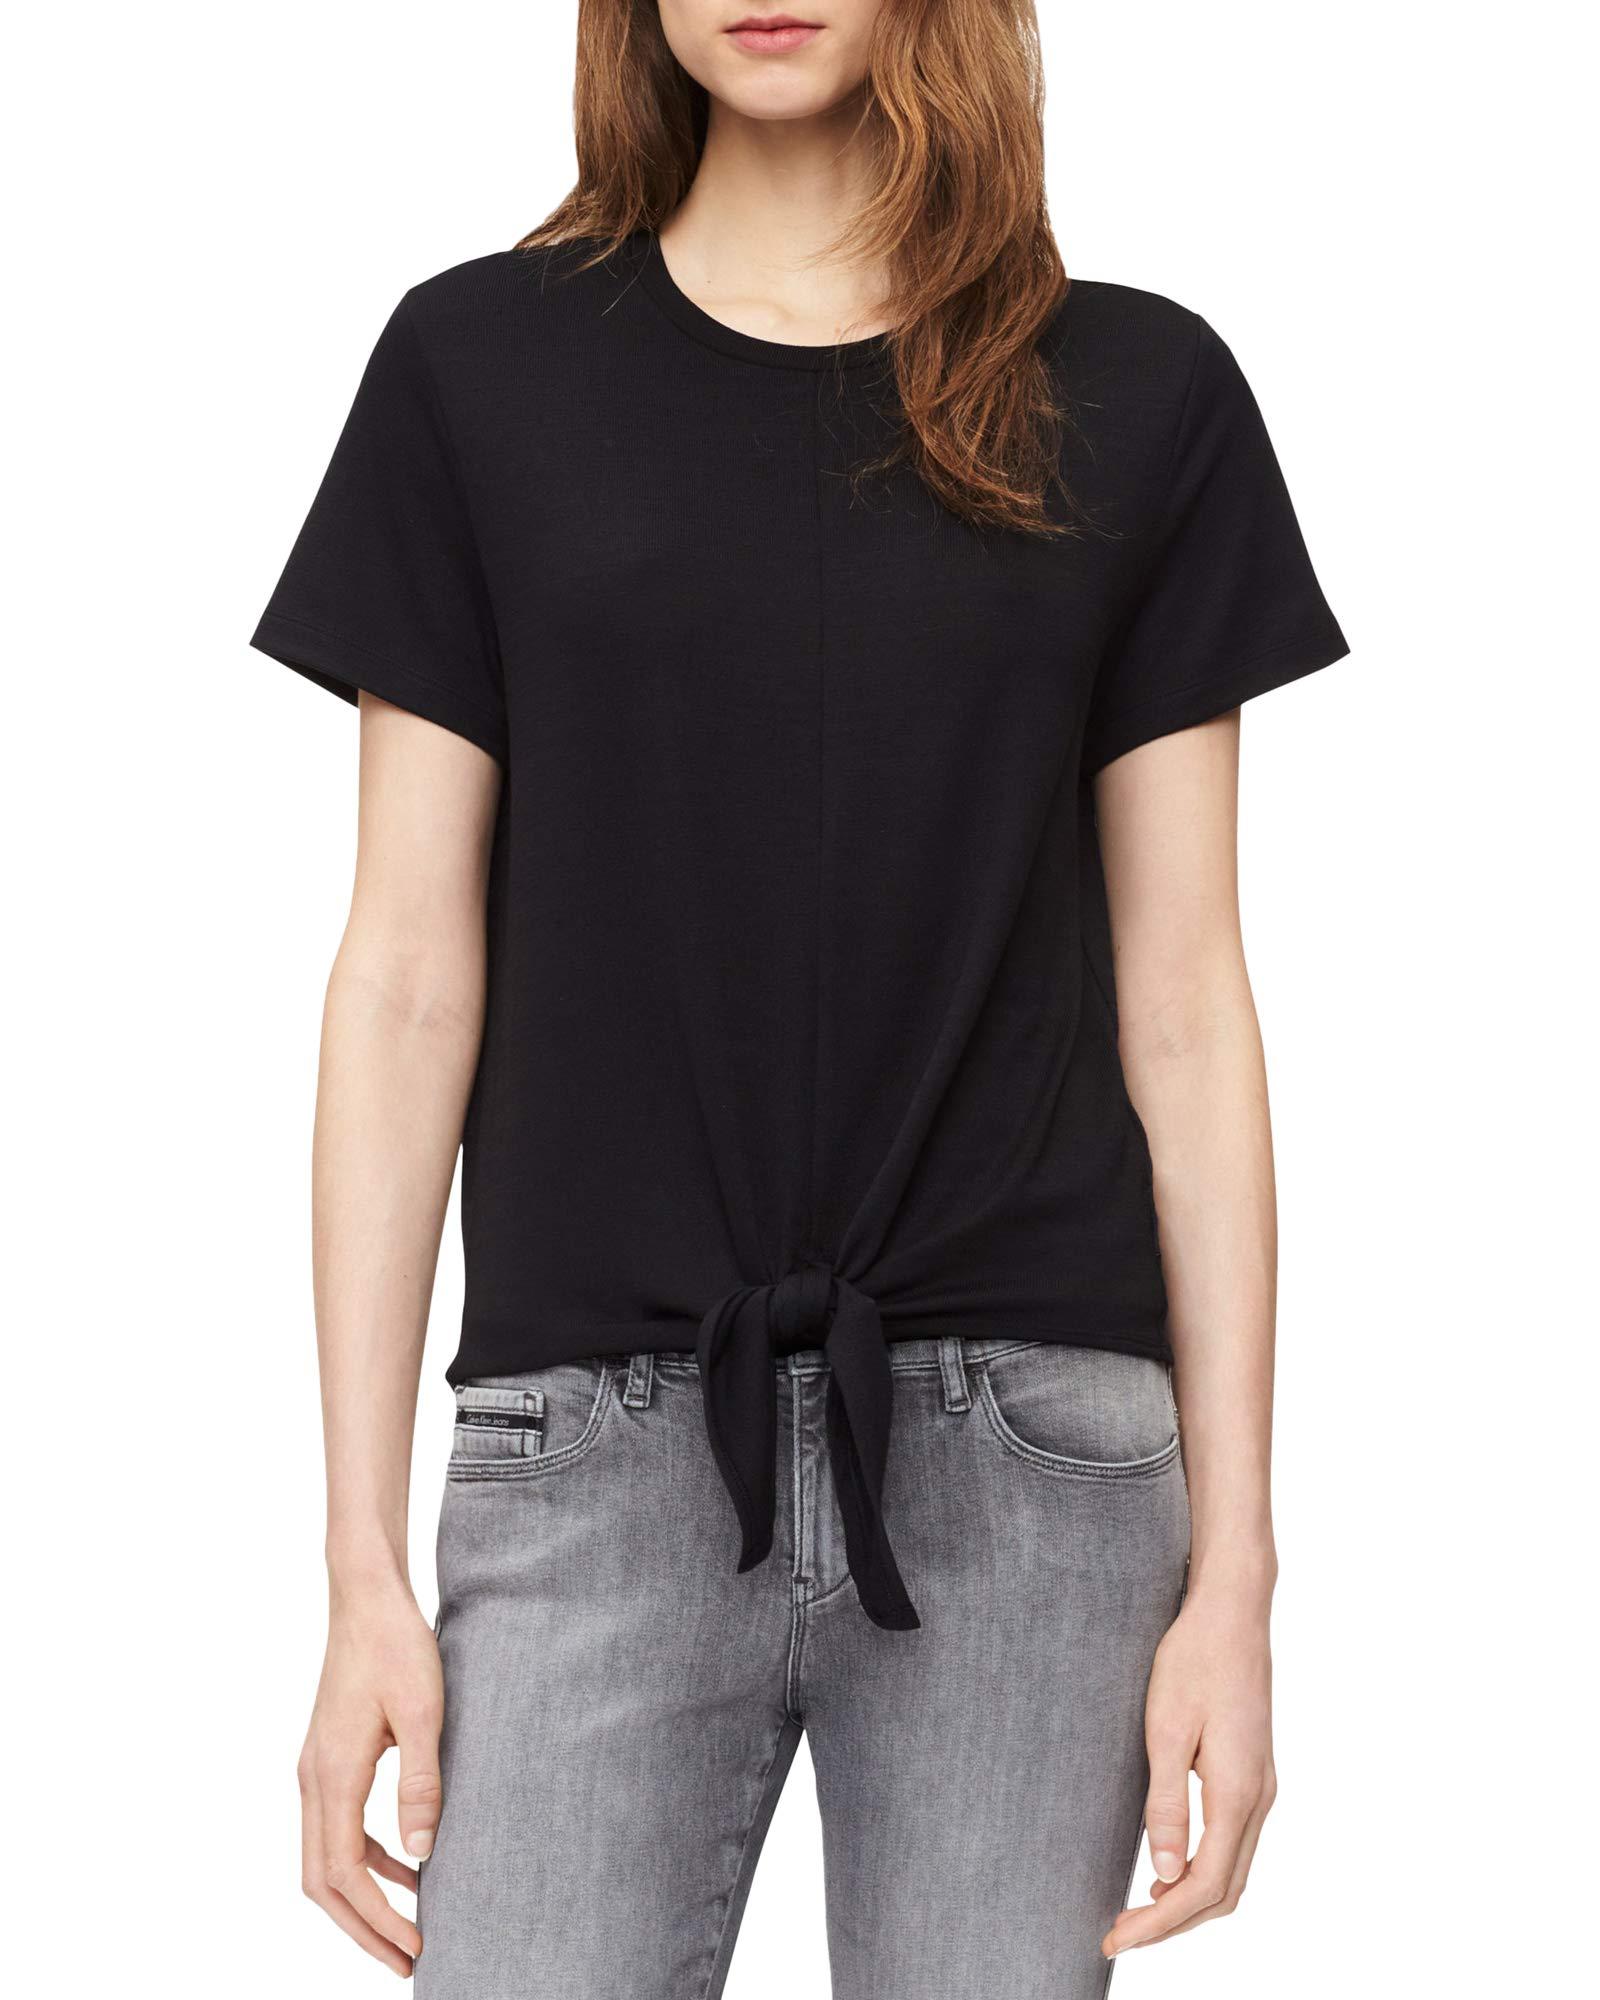 Calvin Klein 女士前系带结短袖针织上衣